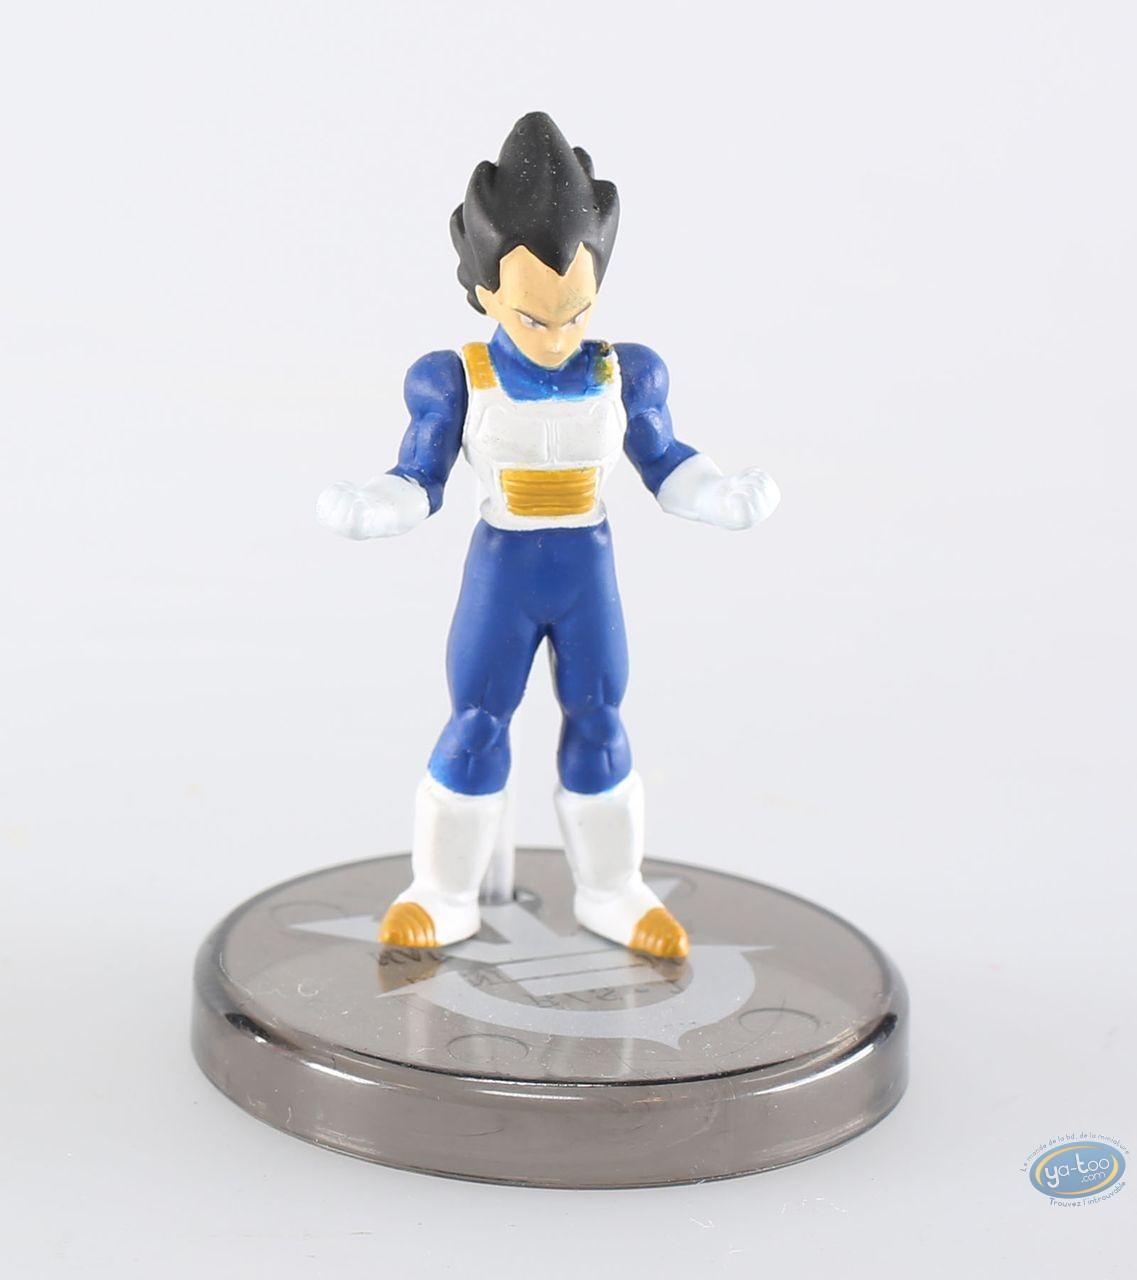 Plastic Figurine, Dragon Ball Z : Vegeta